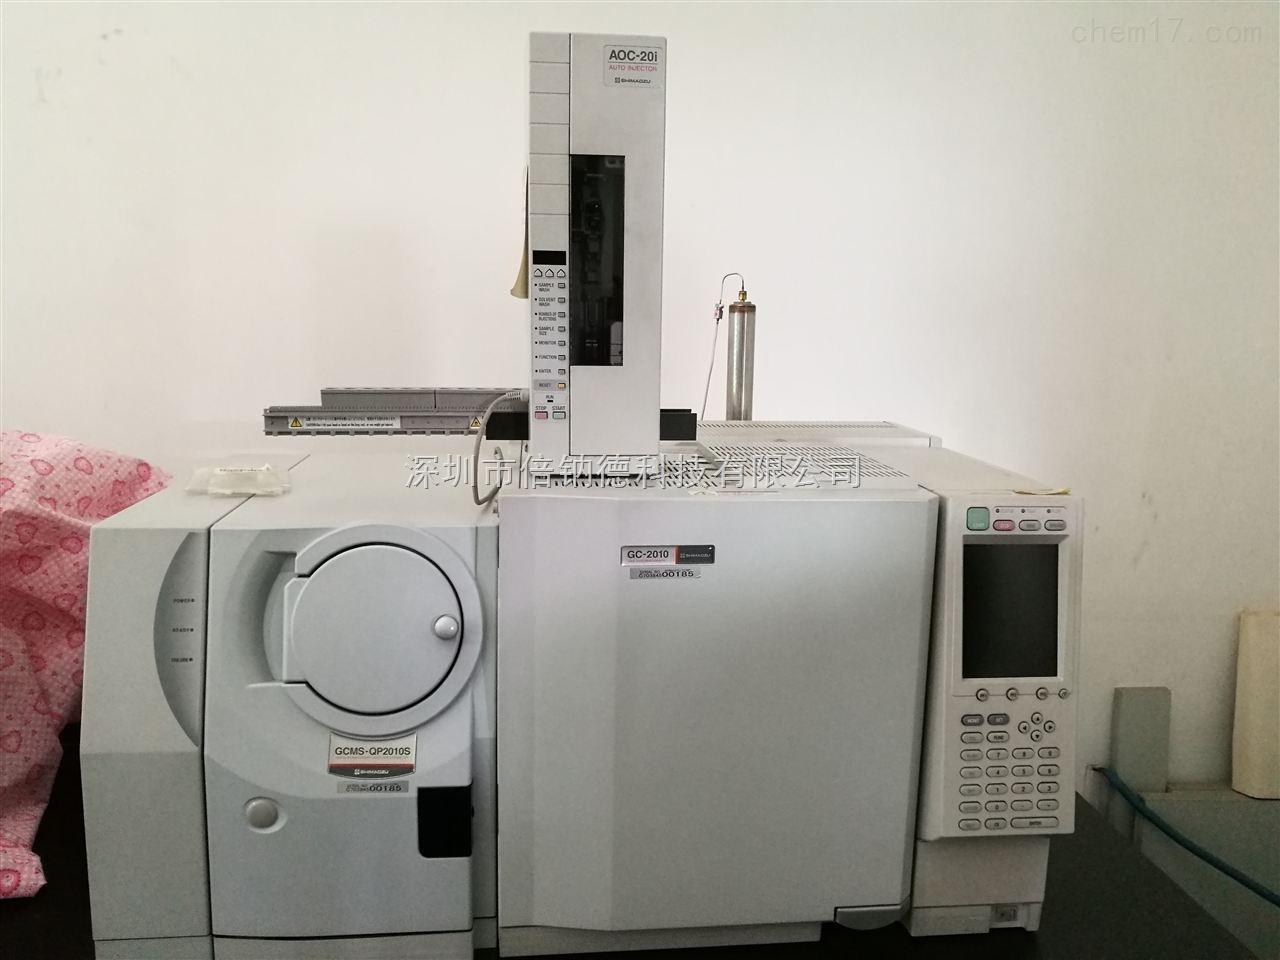 gcms-qp2010 plus 二手岛津气质联用仪gcms-qp2010 plus